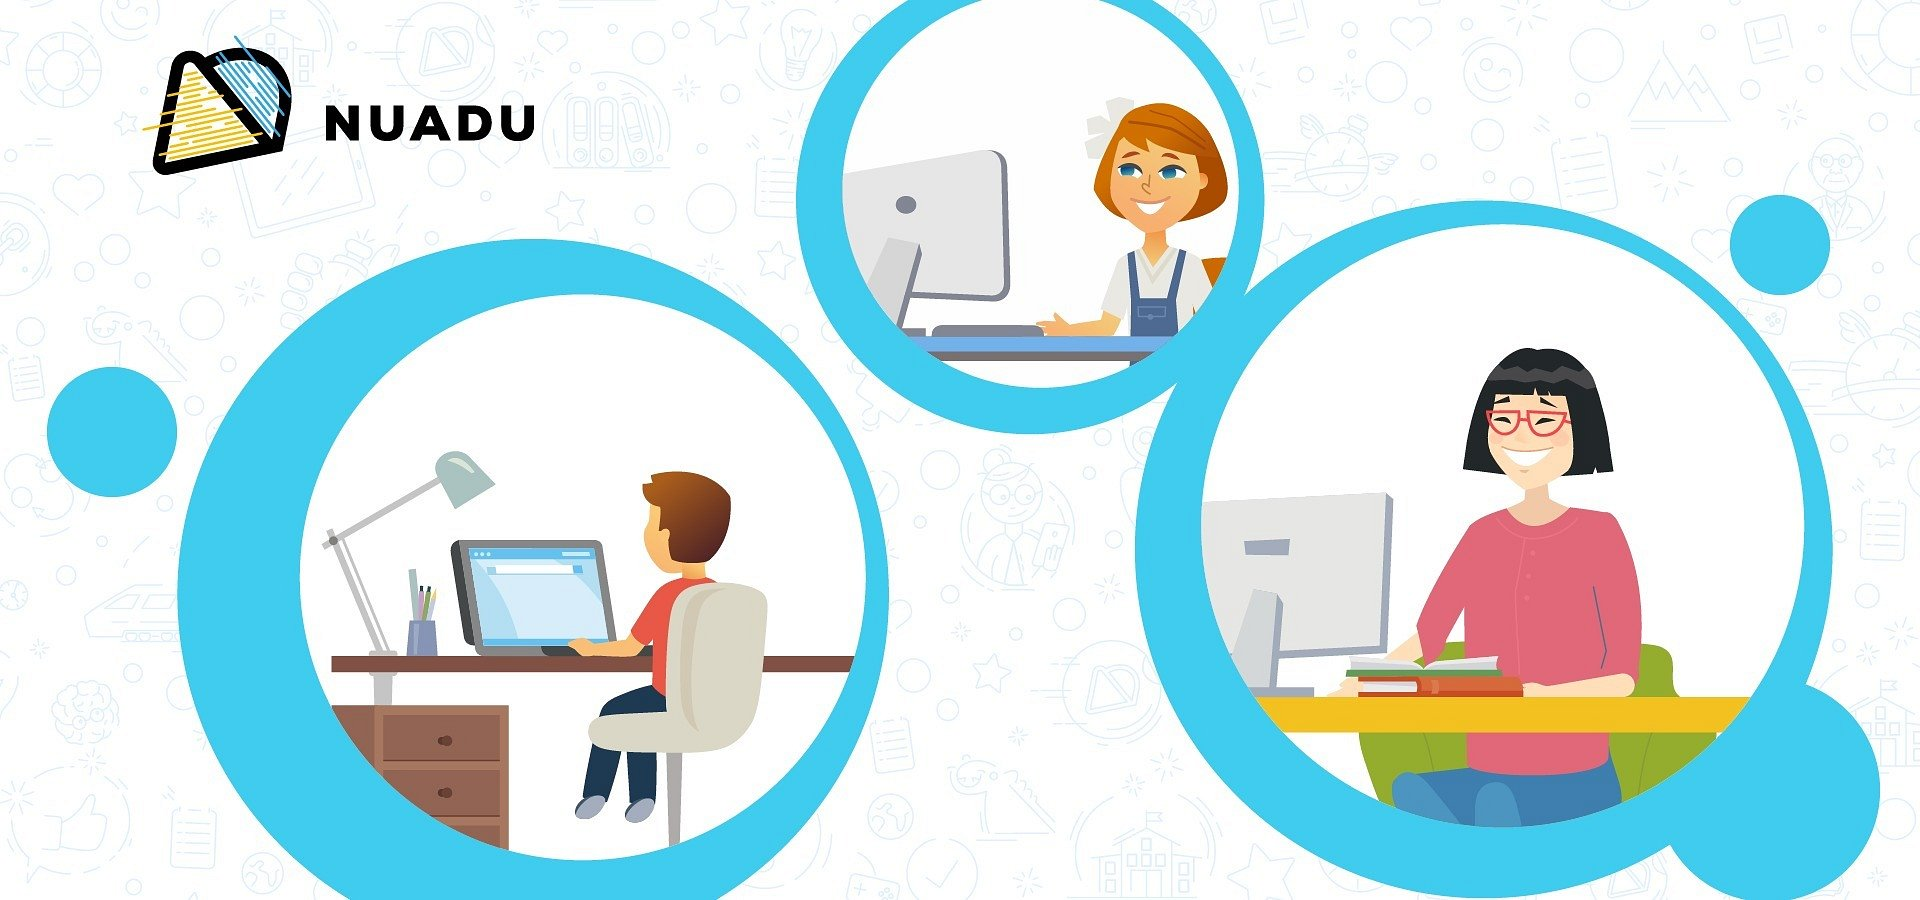 Siapkan ruang kelas online kolaboratif Anda menggunakan alat yang tepat